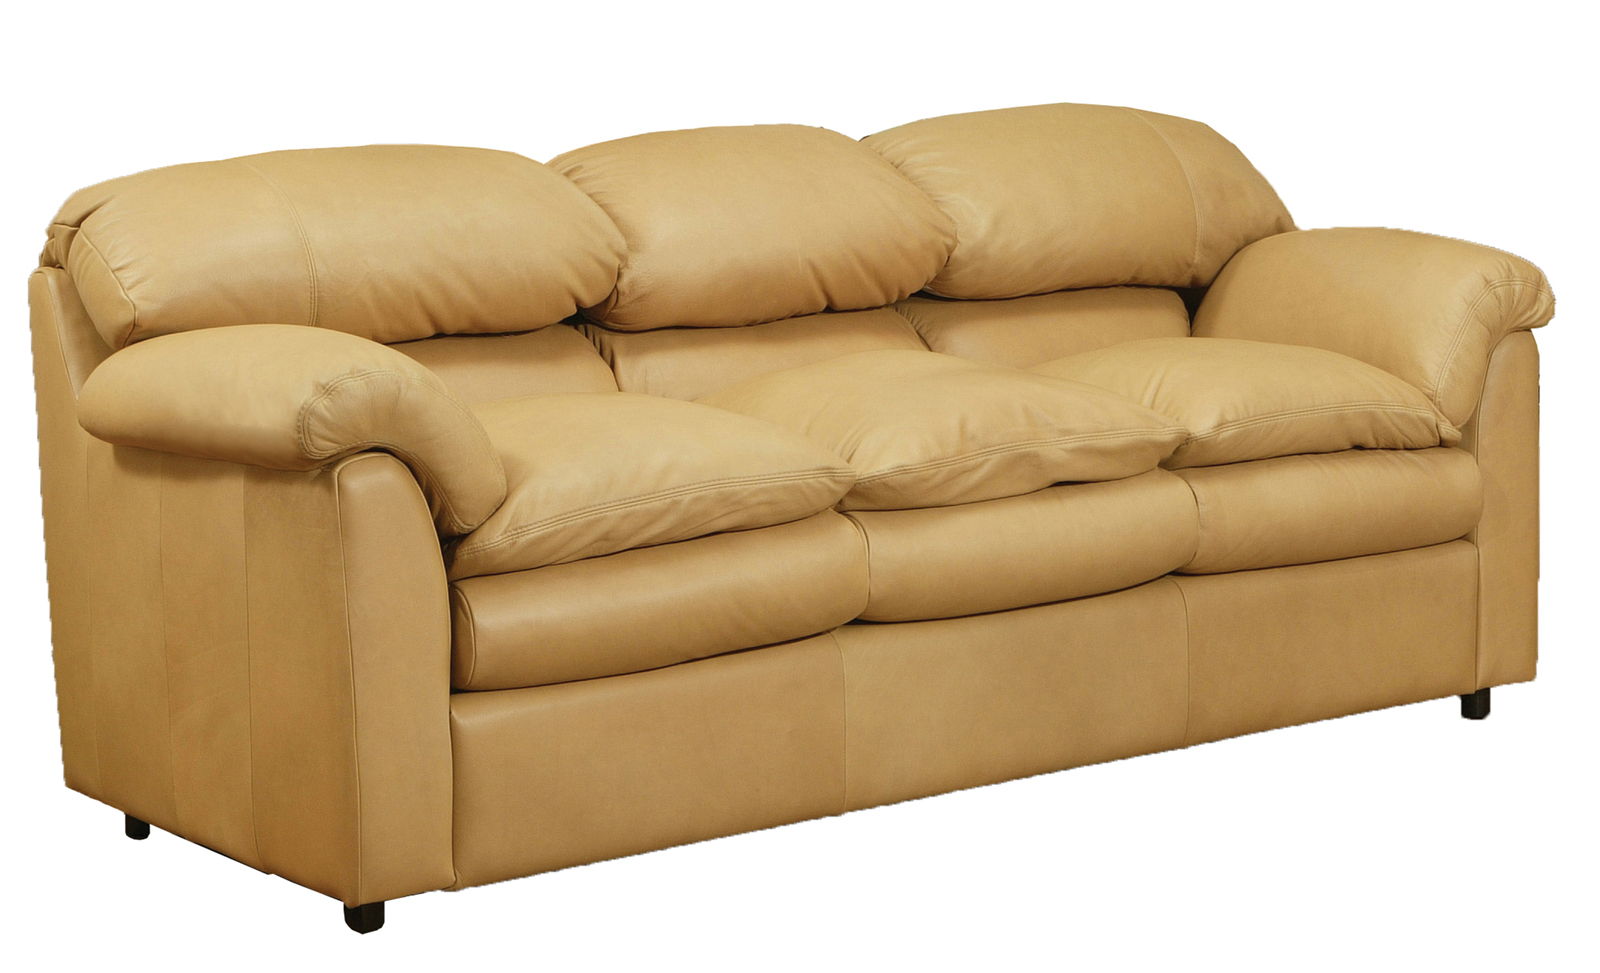 Phoenix Sofa – Arizona Leather Interiors